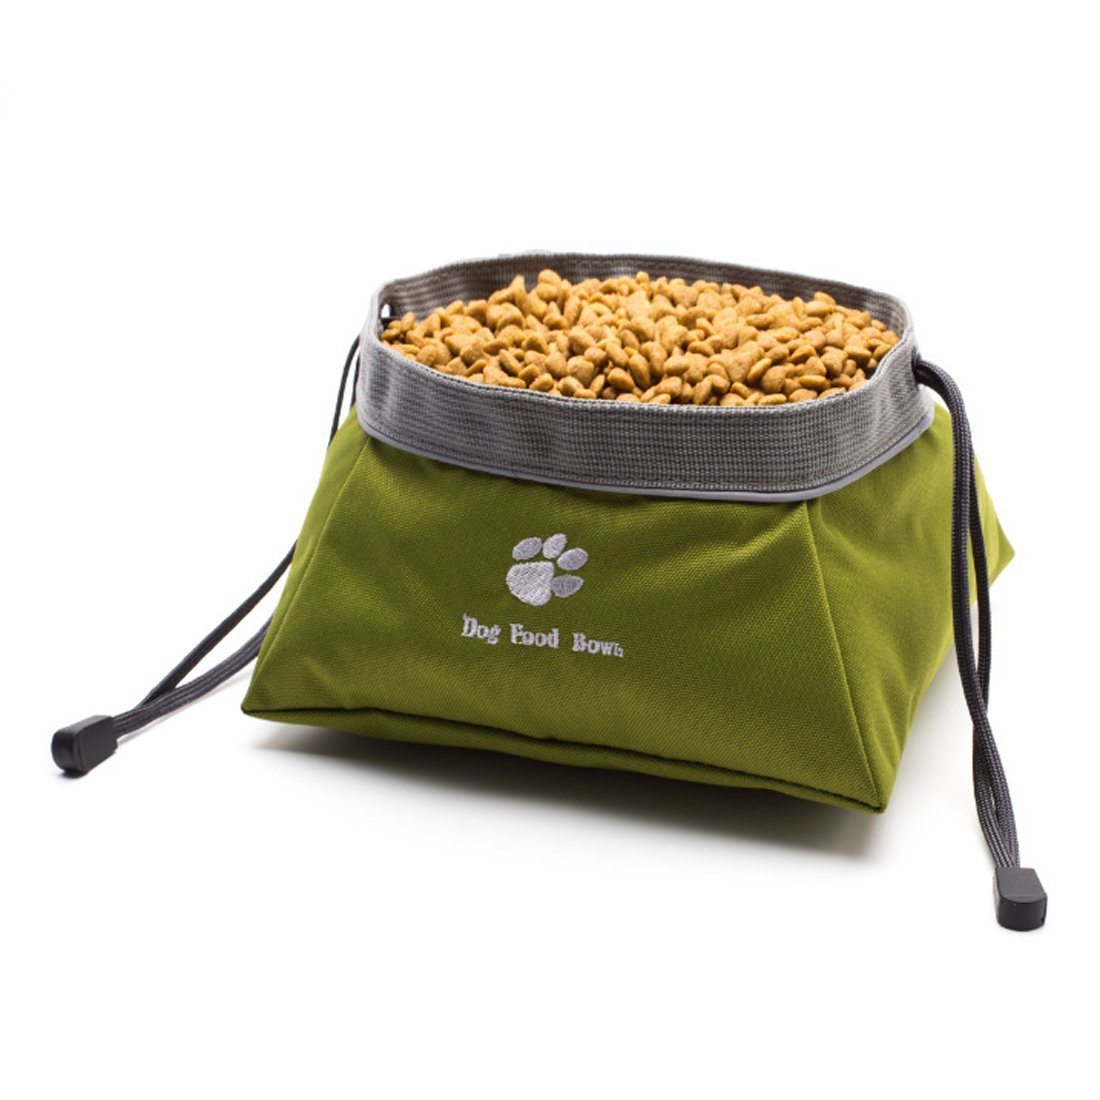 Collapsible Dog Bowl Portable Waterproof Puppy Bowl,Cat Bowl,Dog Feeder,Dog Food Bowls,Pet Food Basin